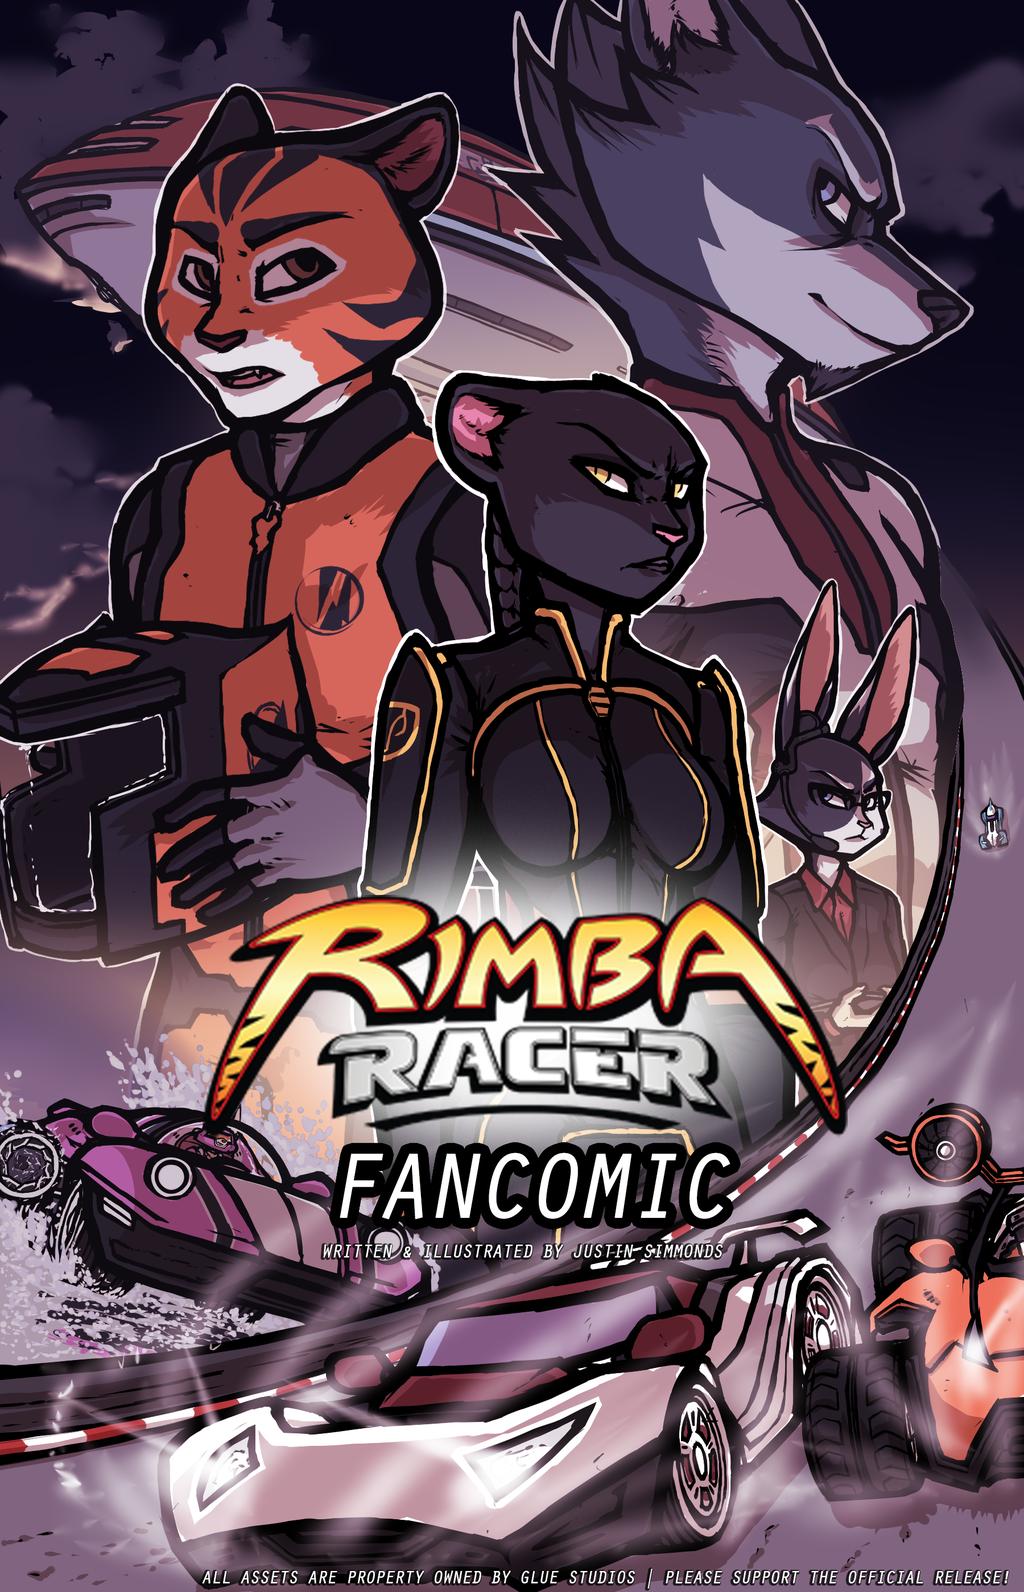 Rimba Racer Fancomic Cover